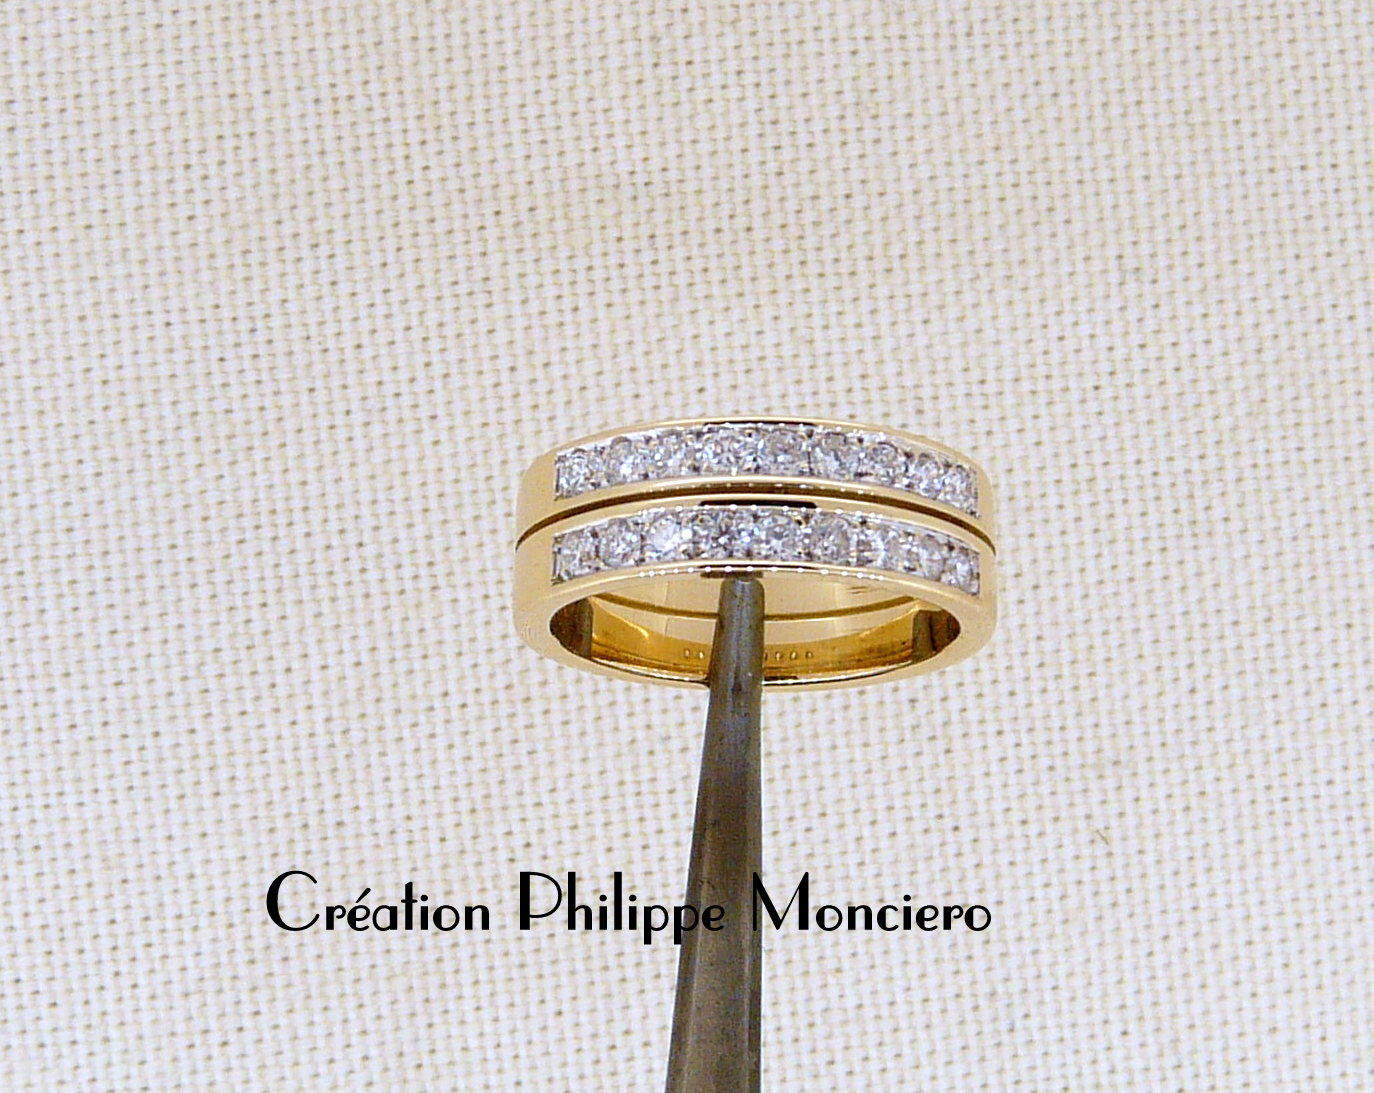 Alliance diamants double rangs. Monciero - Nîmes